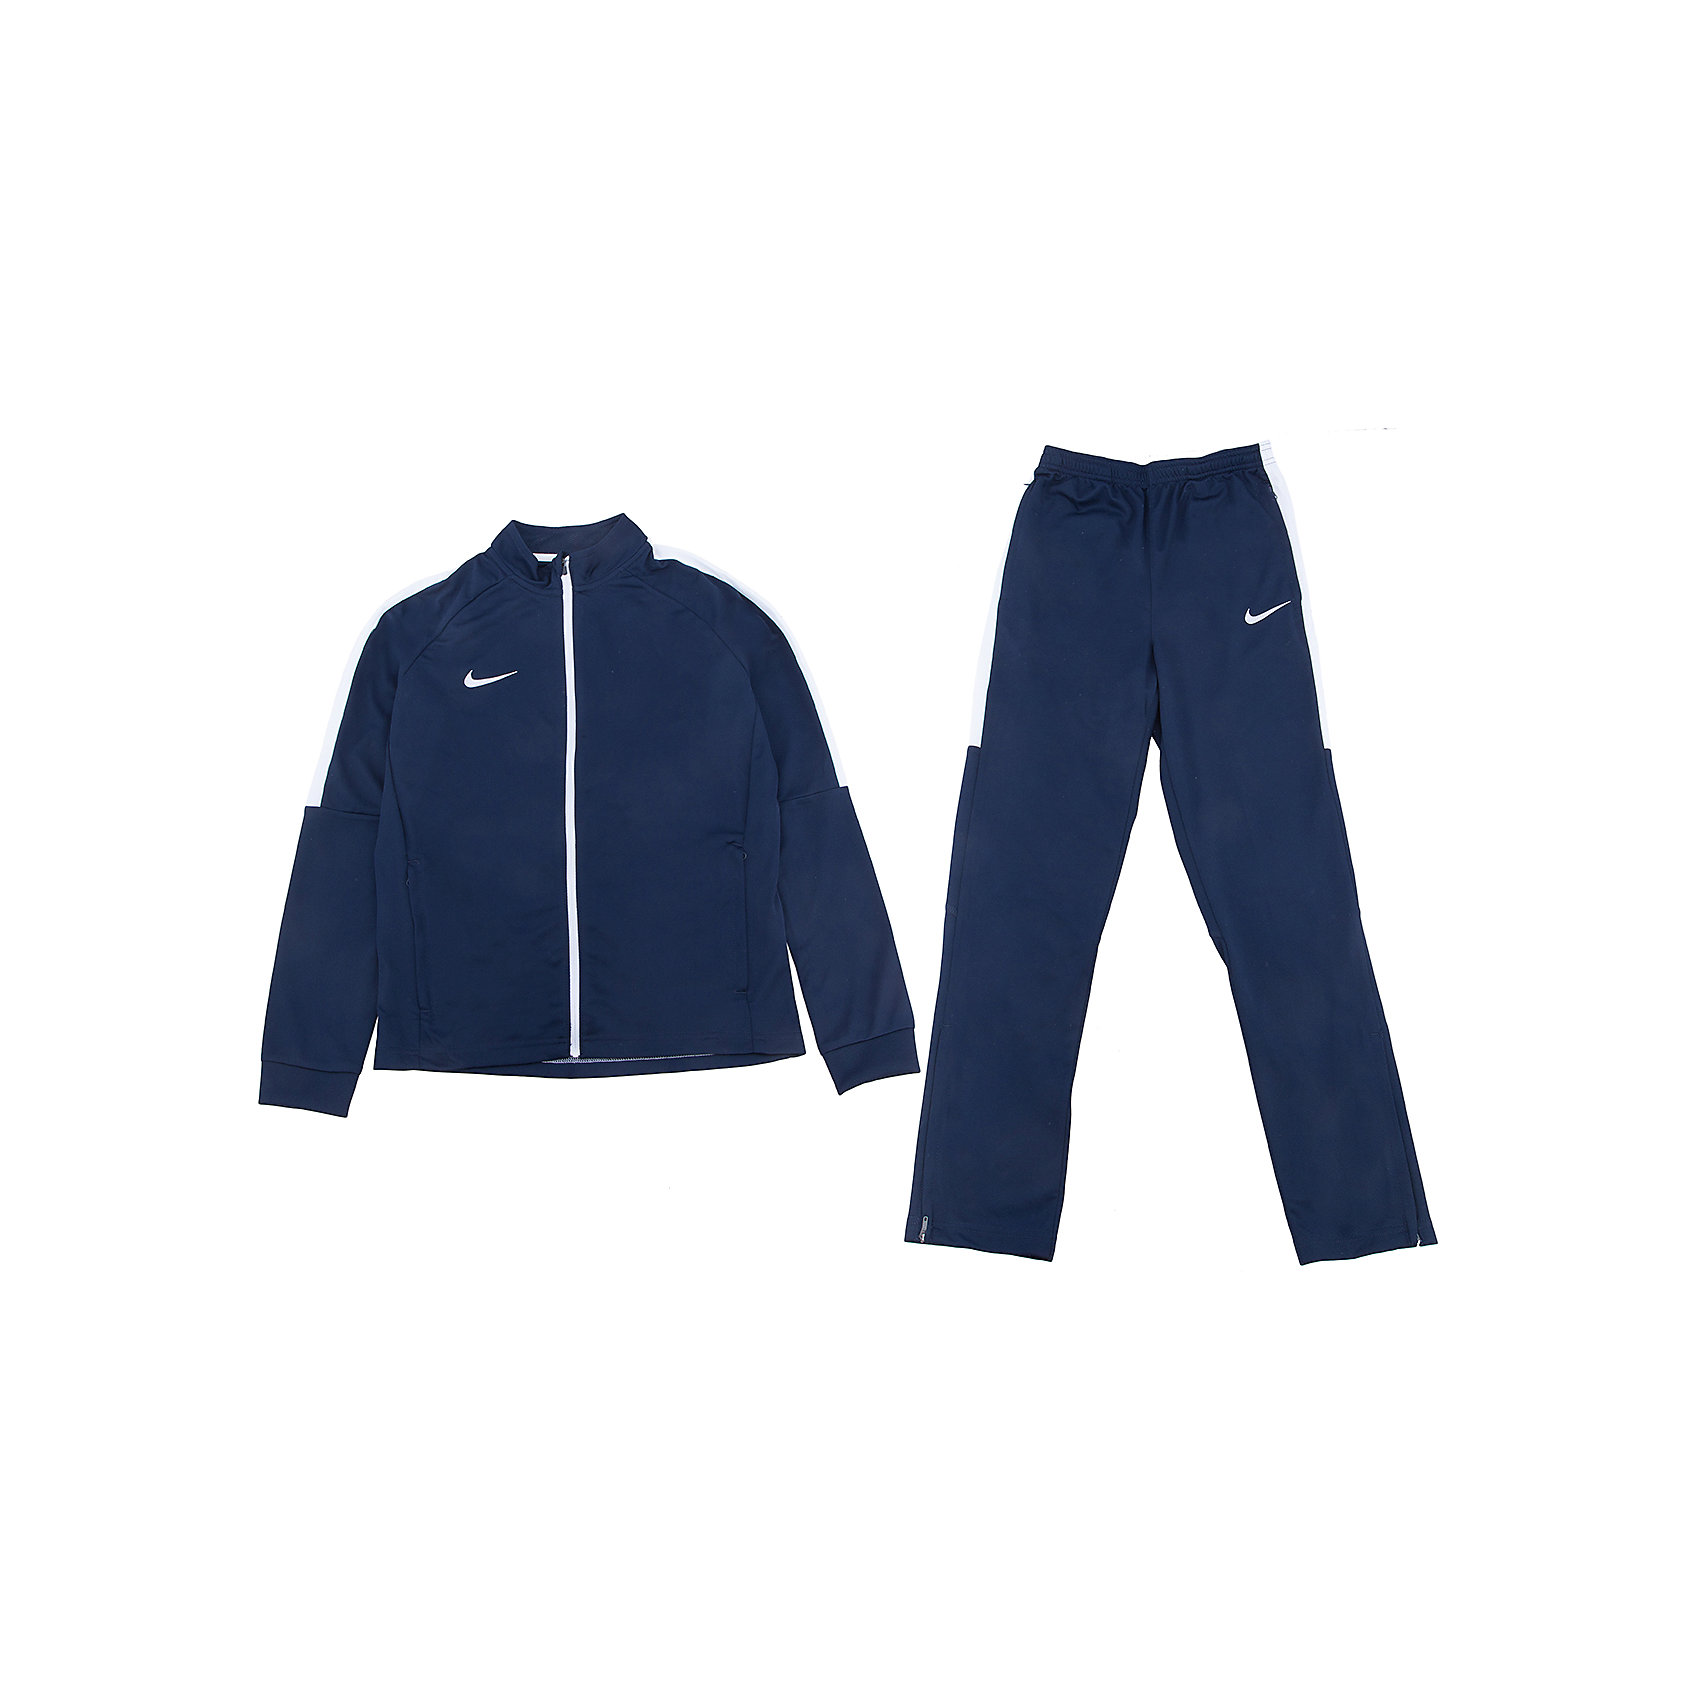 Спортивный костюм NIKEСпортивная одежда<br>Спортивный костюм NIKE<br>Состав:<br>полиэстер 100%<br><br>Ширина мм: 247<br>Глубина мм: 16<br>Высота мм: 140<br>Вес г: 225<br>Цвет: синий<br>Возраст от месяцев: 168<br>Возраст до месяцев: 180<br>Пол: Унисекс<br>Возраст: Детский<br>Размер: 158/170,122/128,128/134,135/140,147/158<br>SKU: 5532771